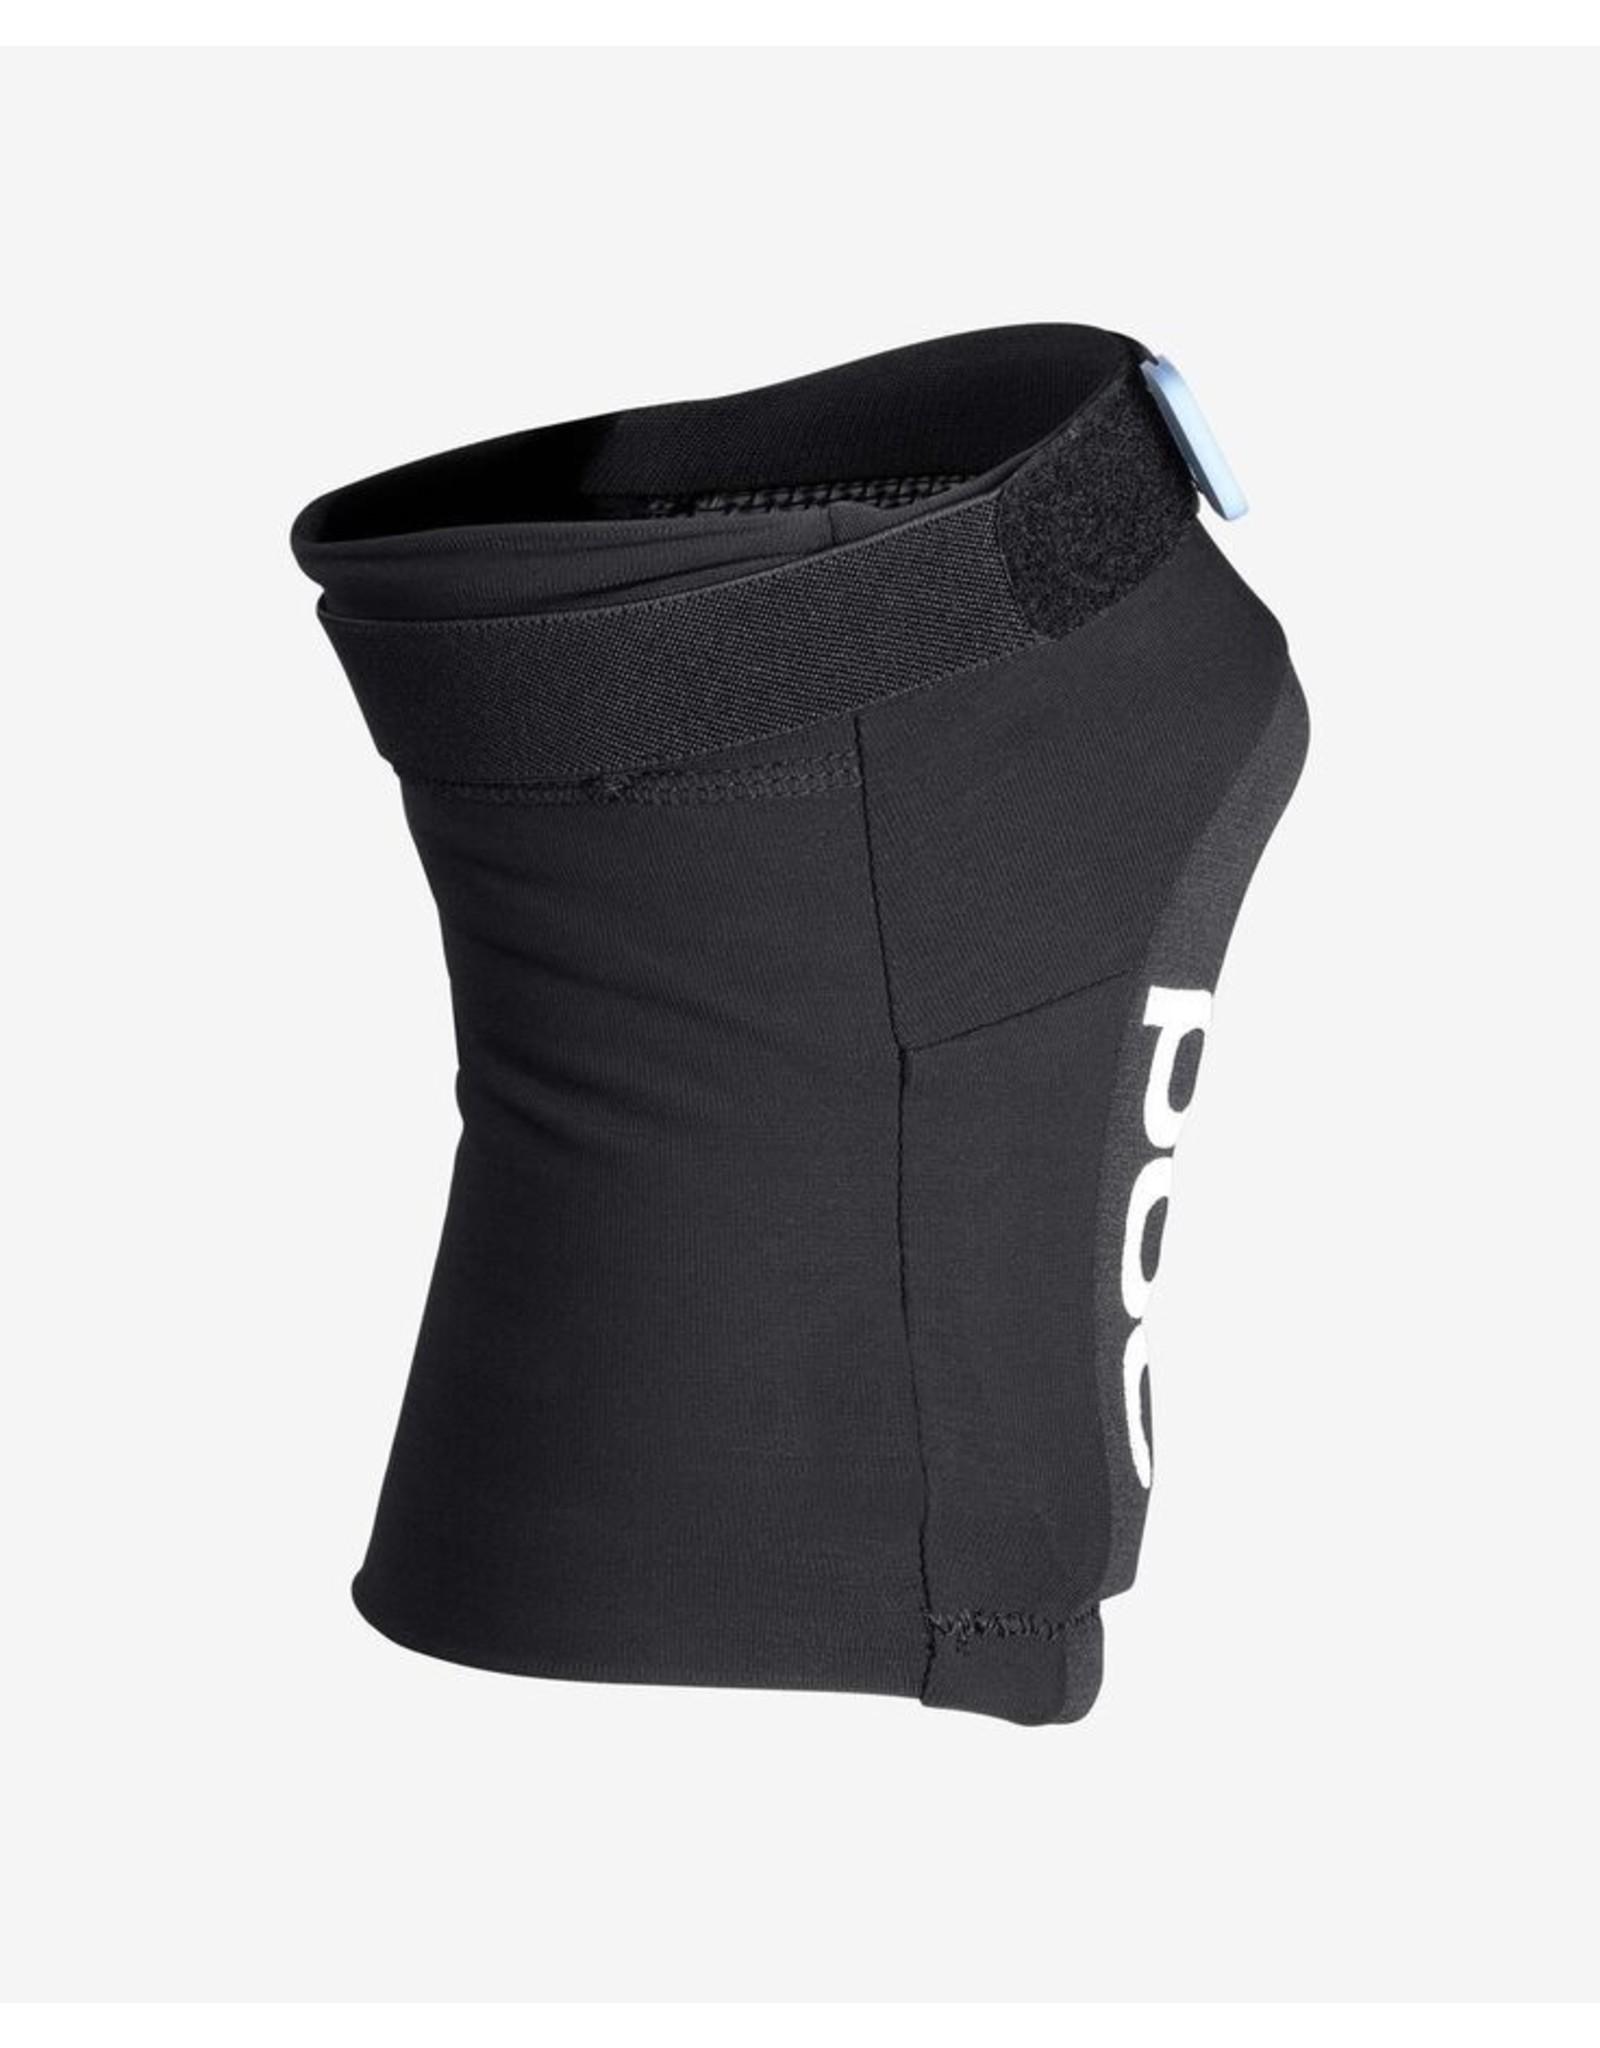 POC POC Joint VPD Air Knee